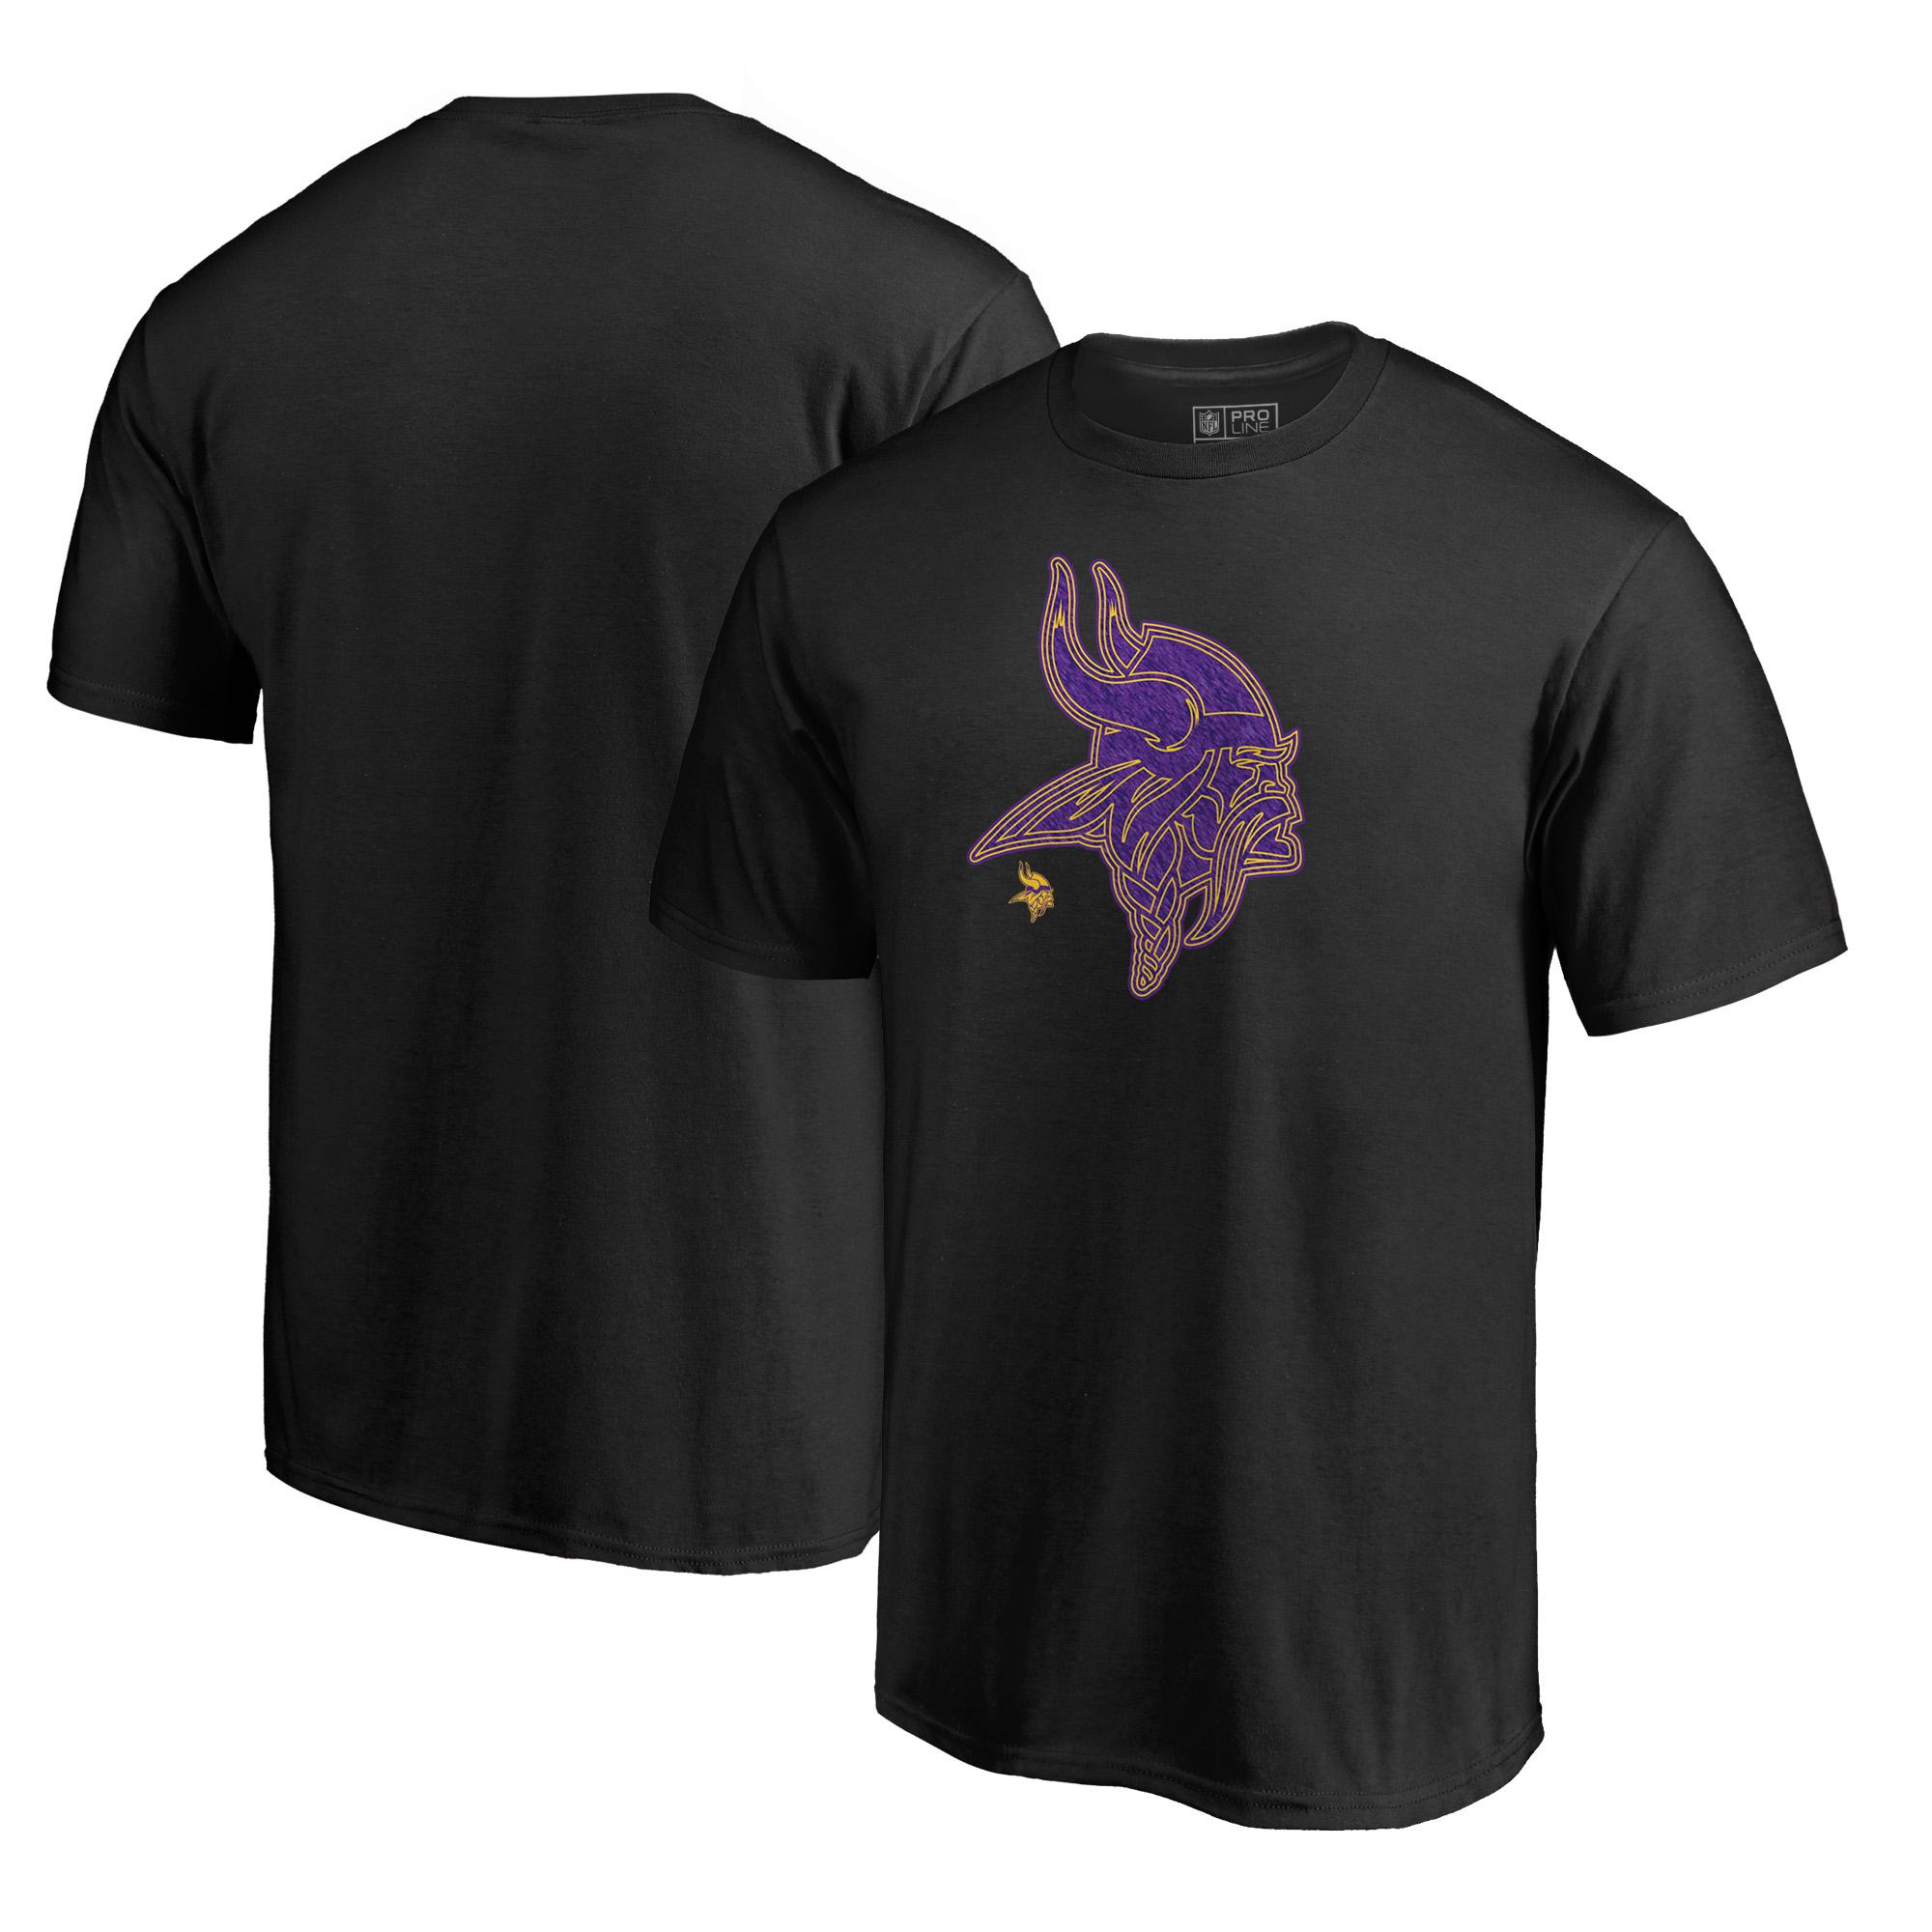 Minnesota Vikings NFL Pro Line by Fanatics Branded Training Camp Hookup T-Shirt - Black